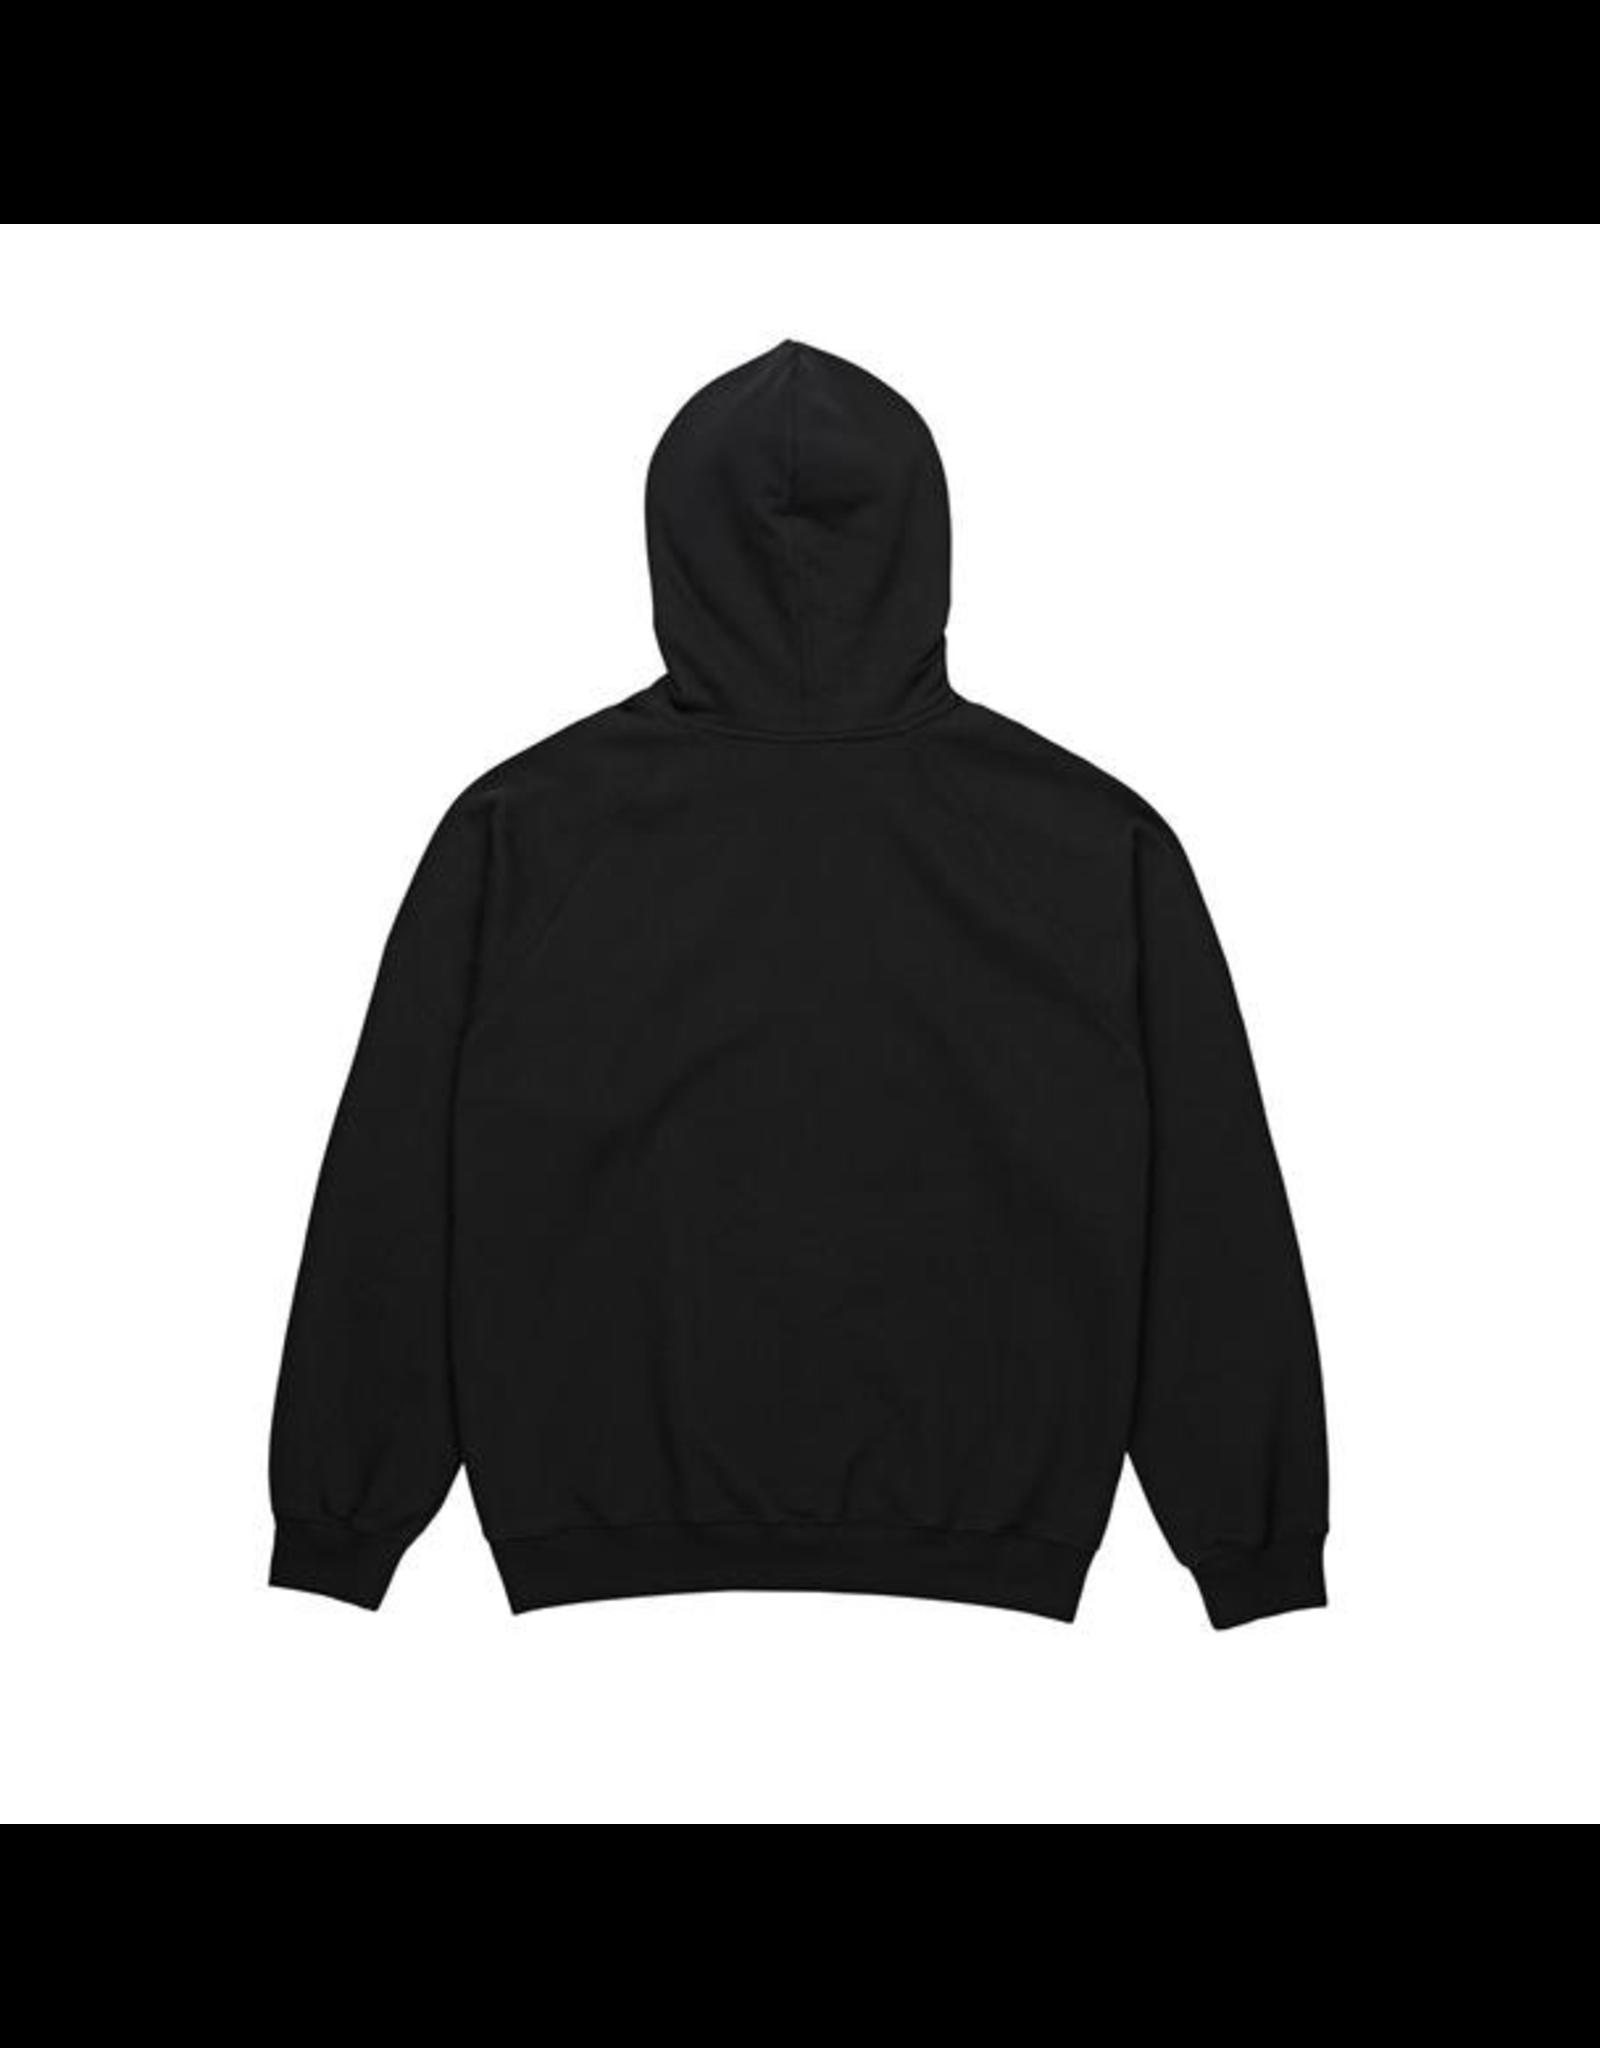 Polar Default Hood